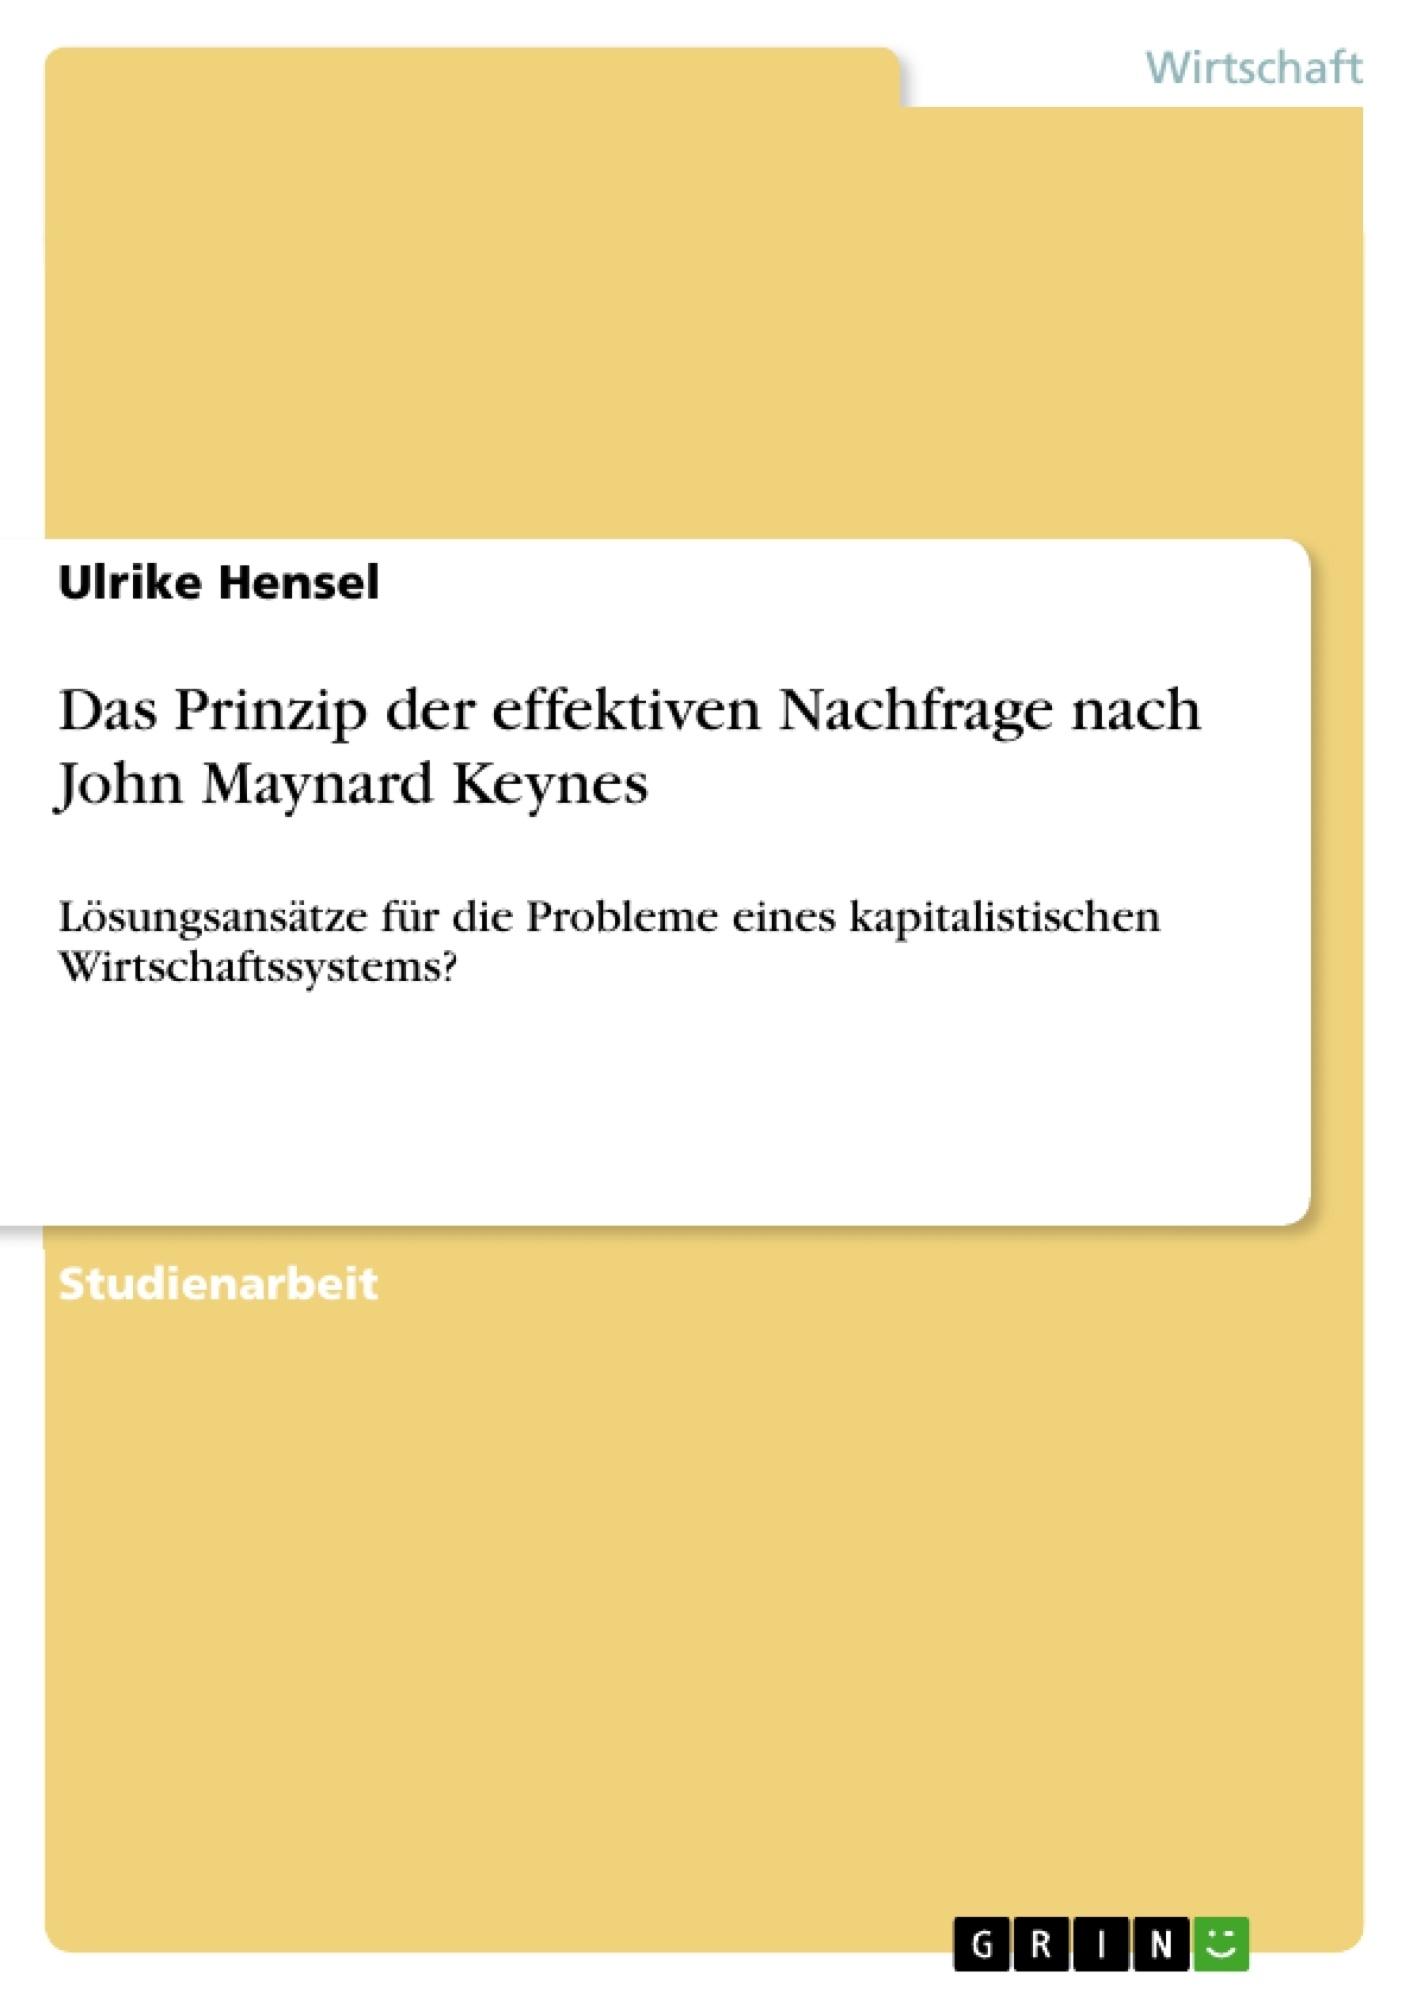 Titel: Das Prinzip der effektiven Nachfrage nach John Maynard Keynes